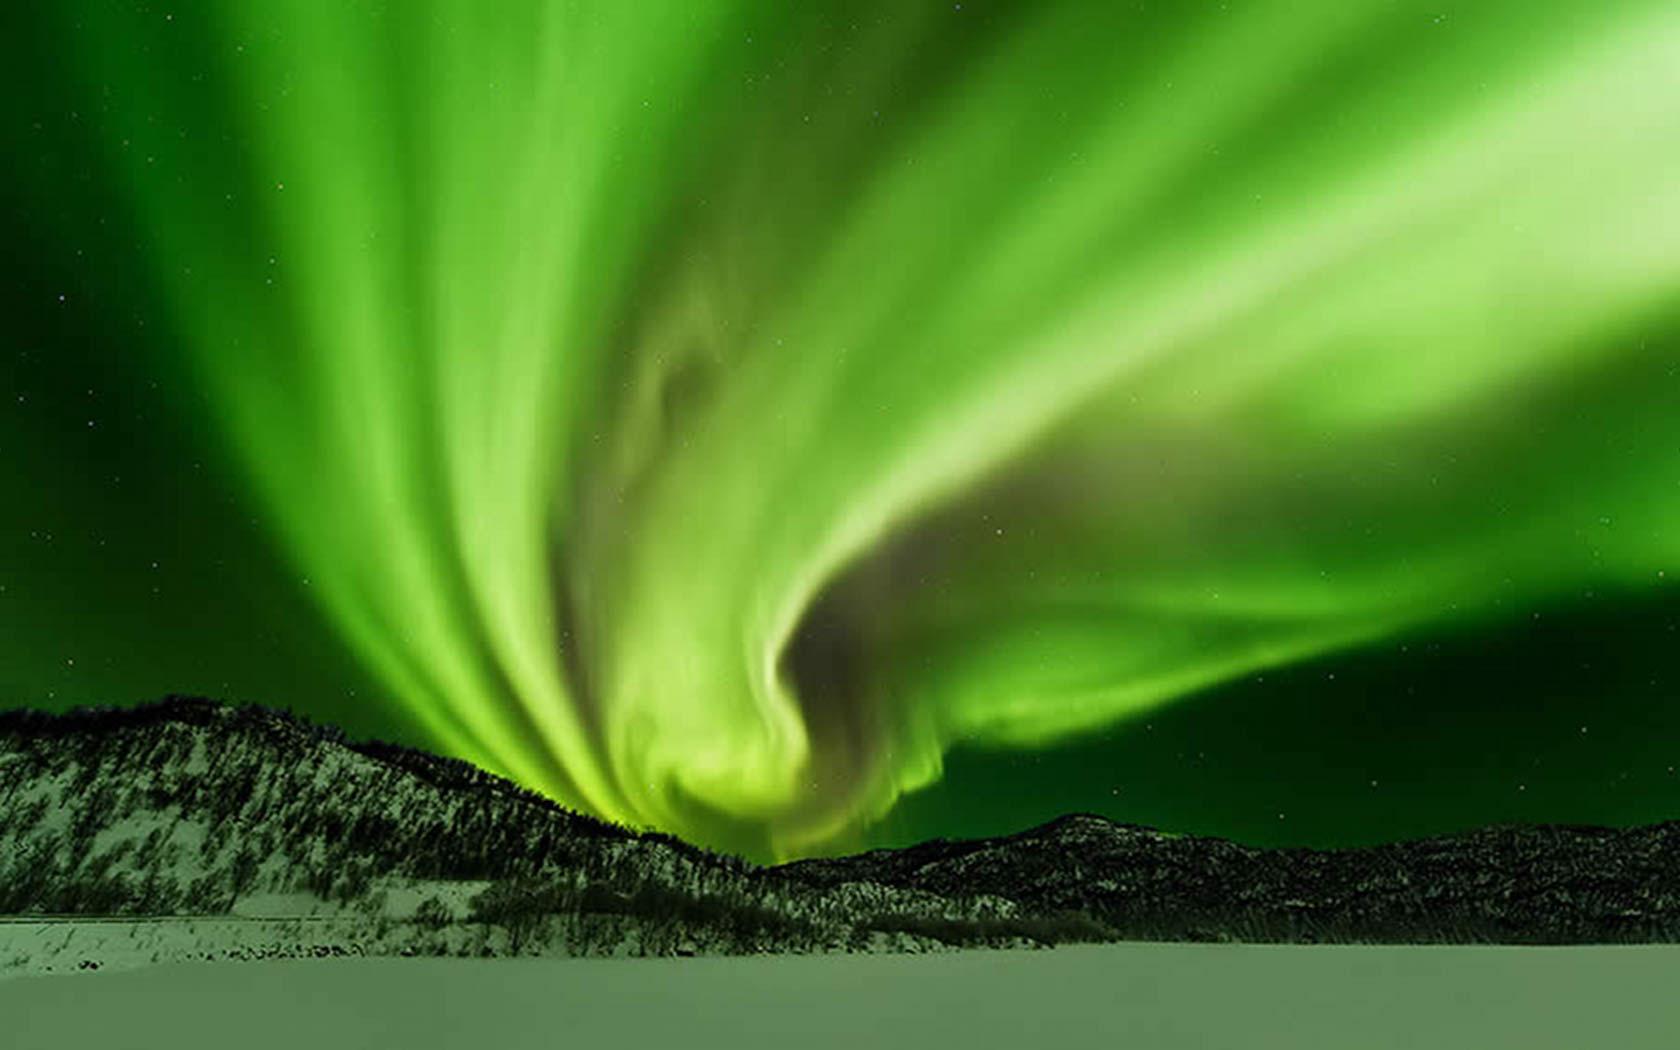 Aurora Borealis Wallpaper hd   HD Wallpapers 1680x1050